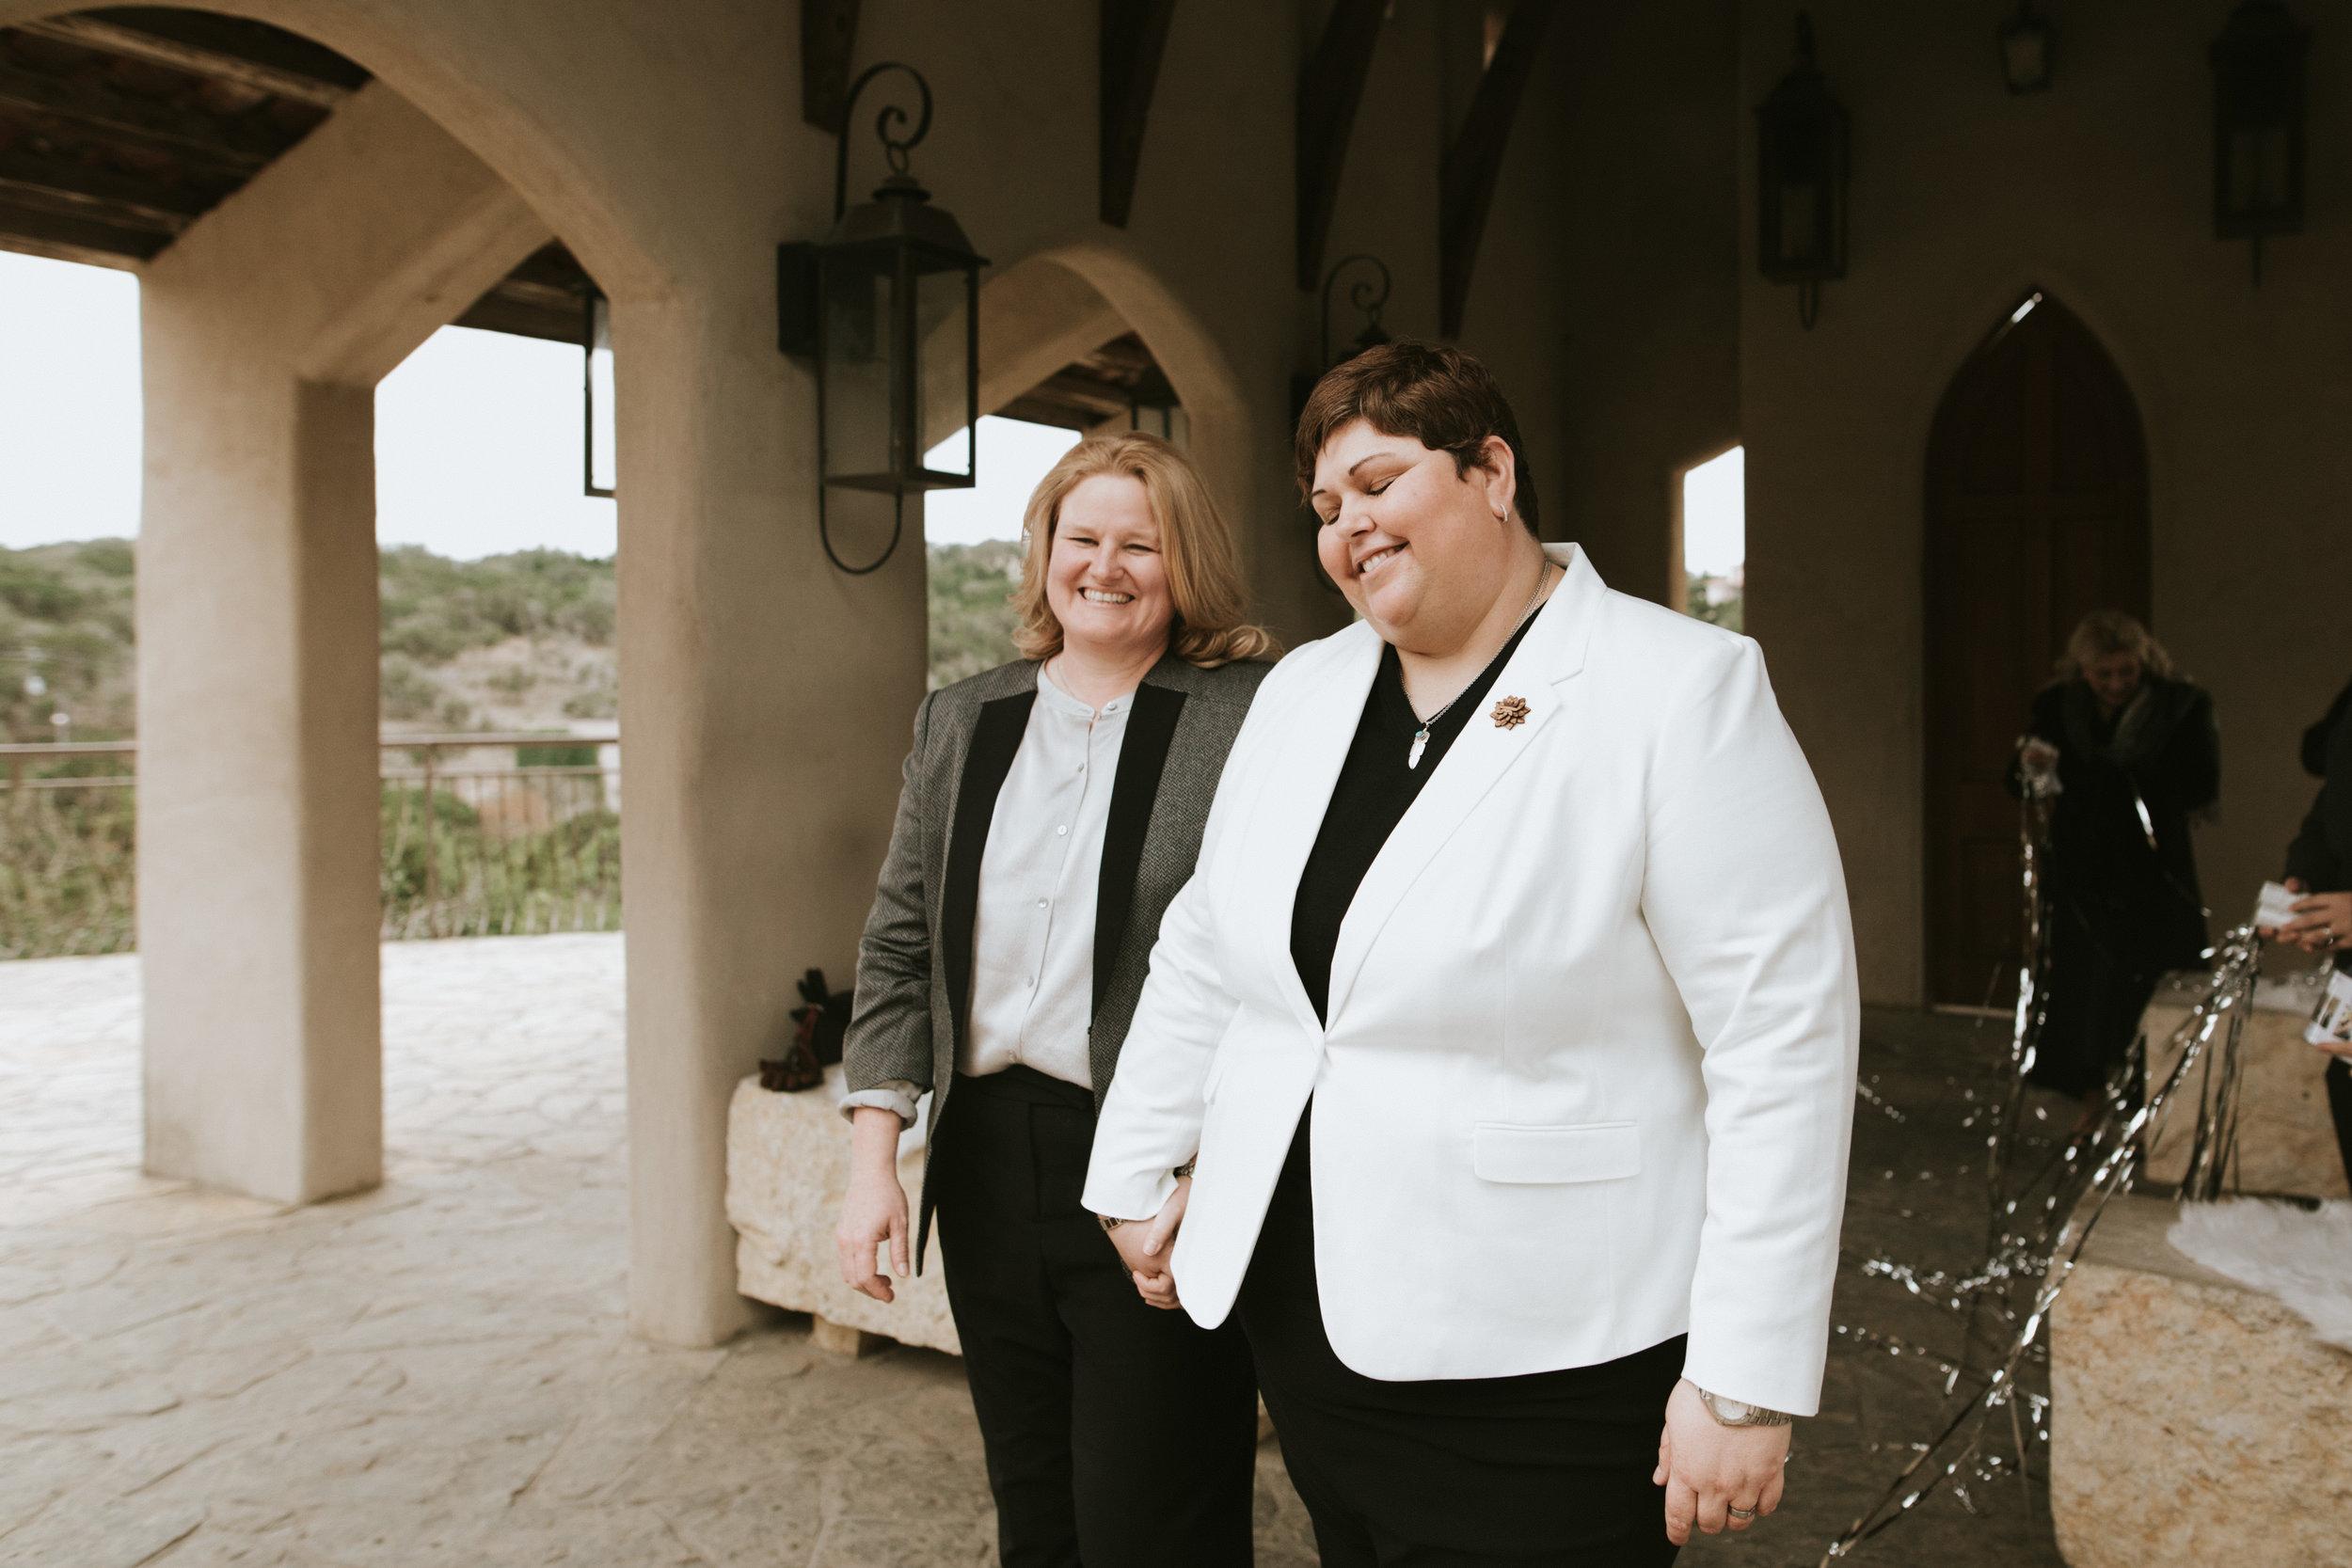 Mari and Johanna Wedding - Diana Ascarrunz Photography-388.JPG